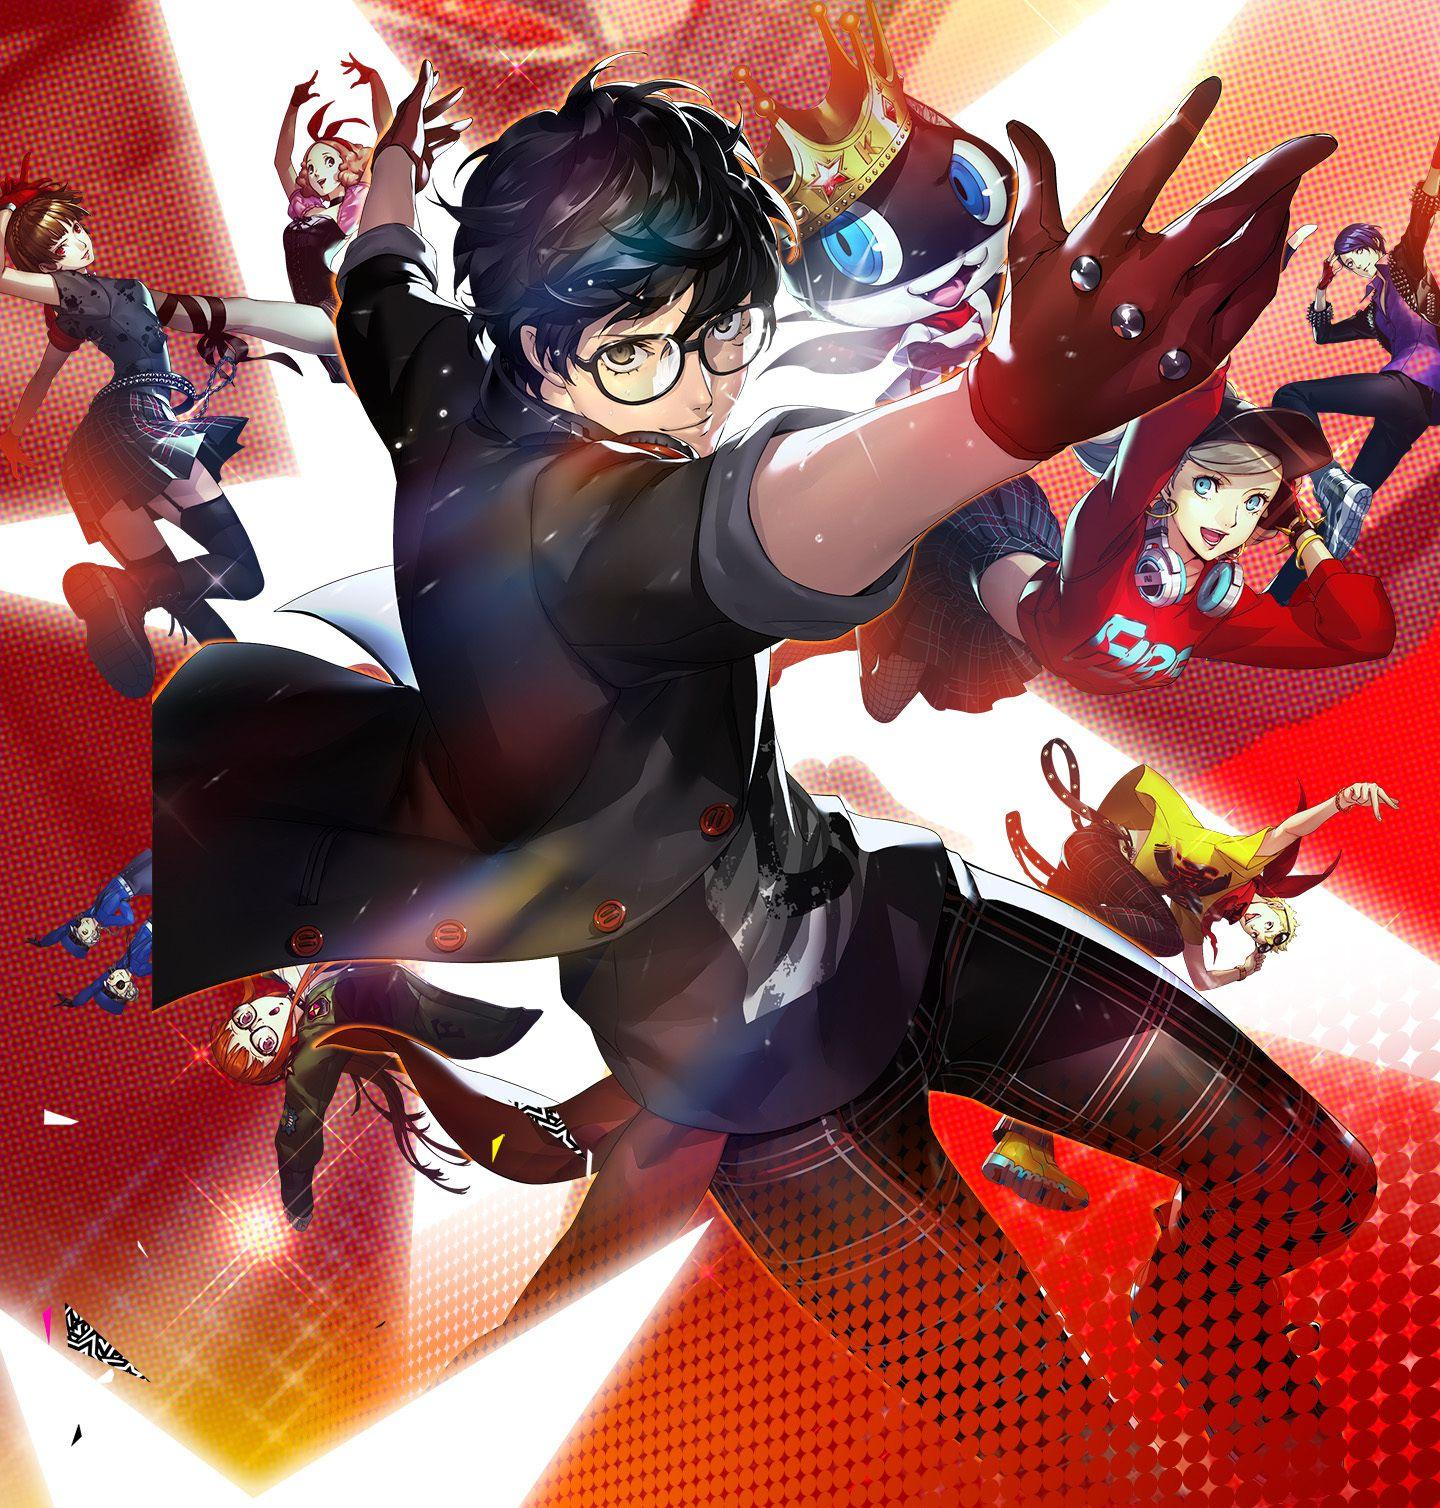 Persona 5 Dancing In Starlight Wallpapers Wallpaper Cave